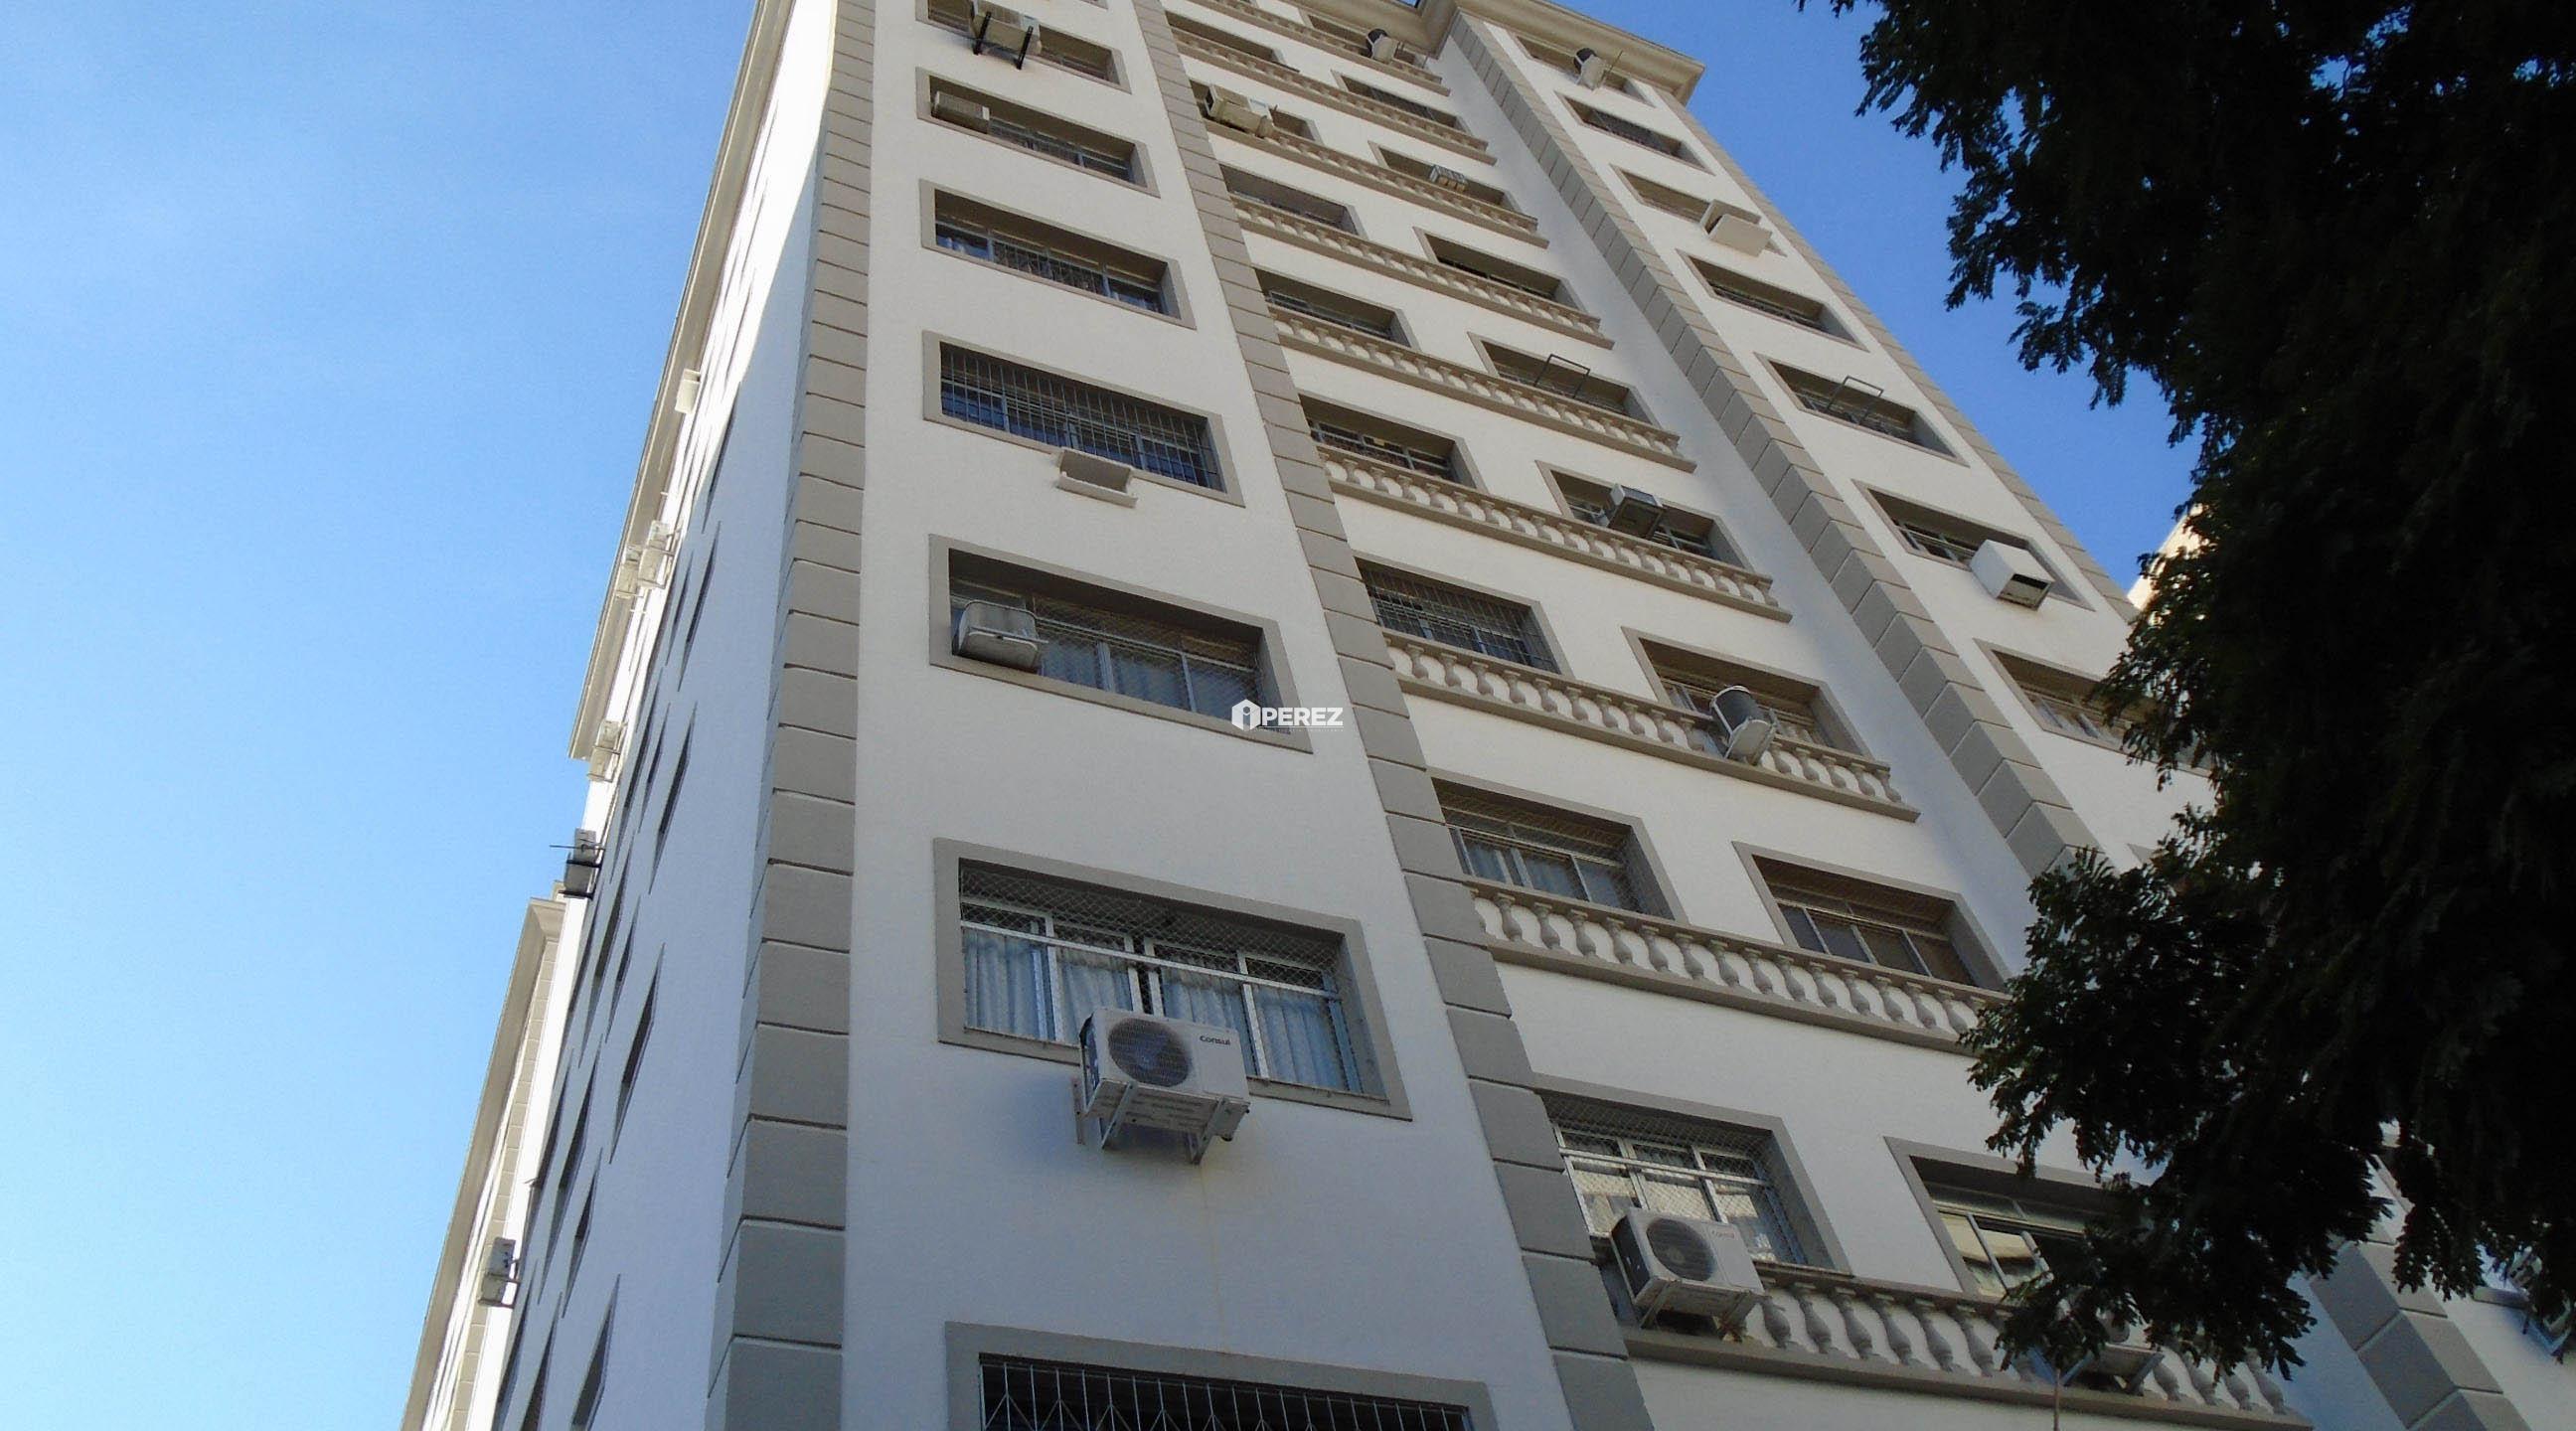 venda-campo-grande-ms-apartamento-dom-aquino-centro-perez-imoveis